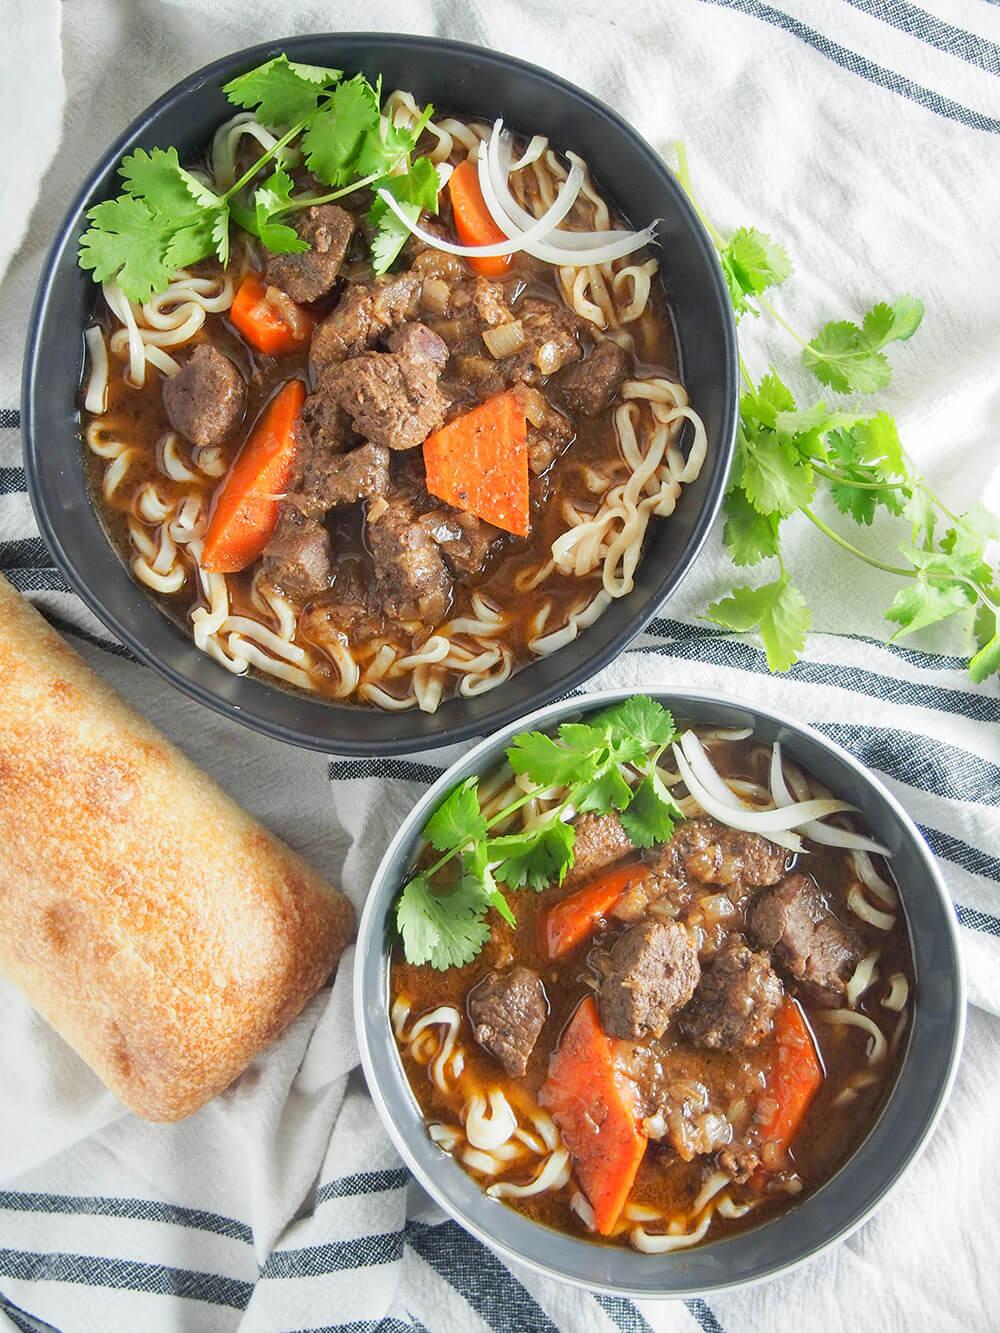 Bo kho - Vietnamese beef stew - Caroline's Cooking